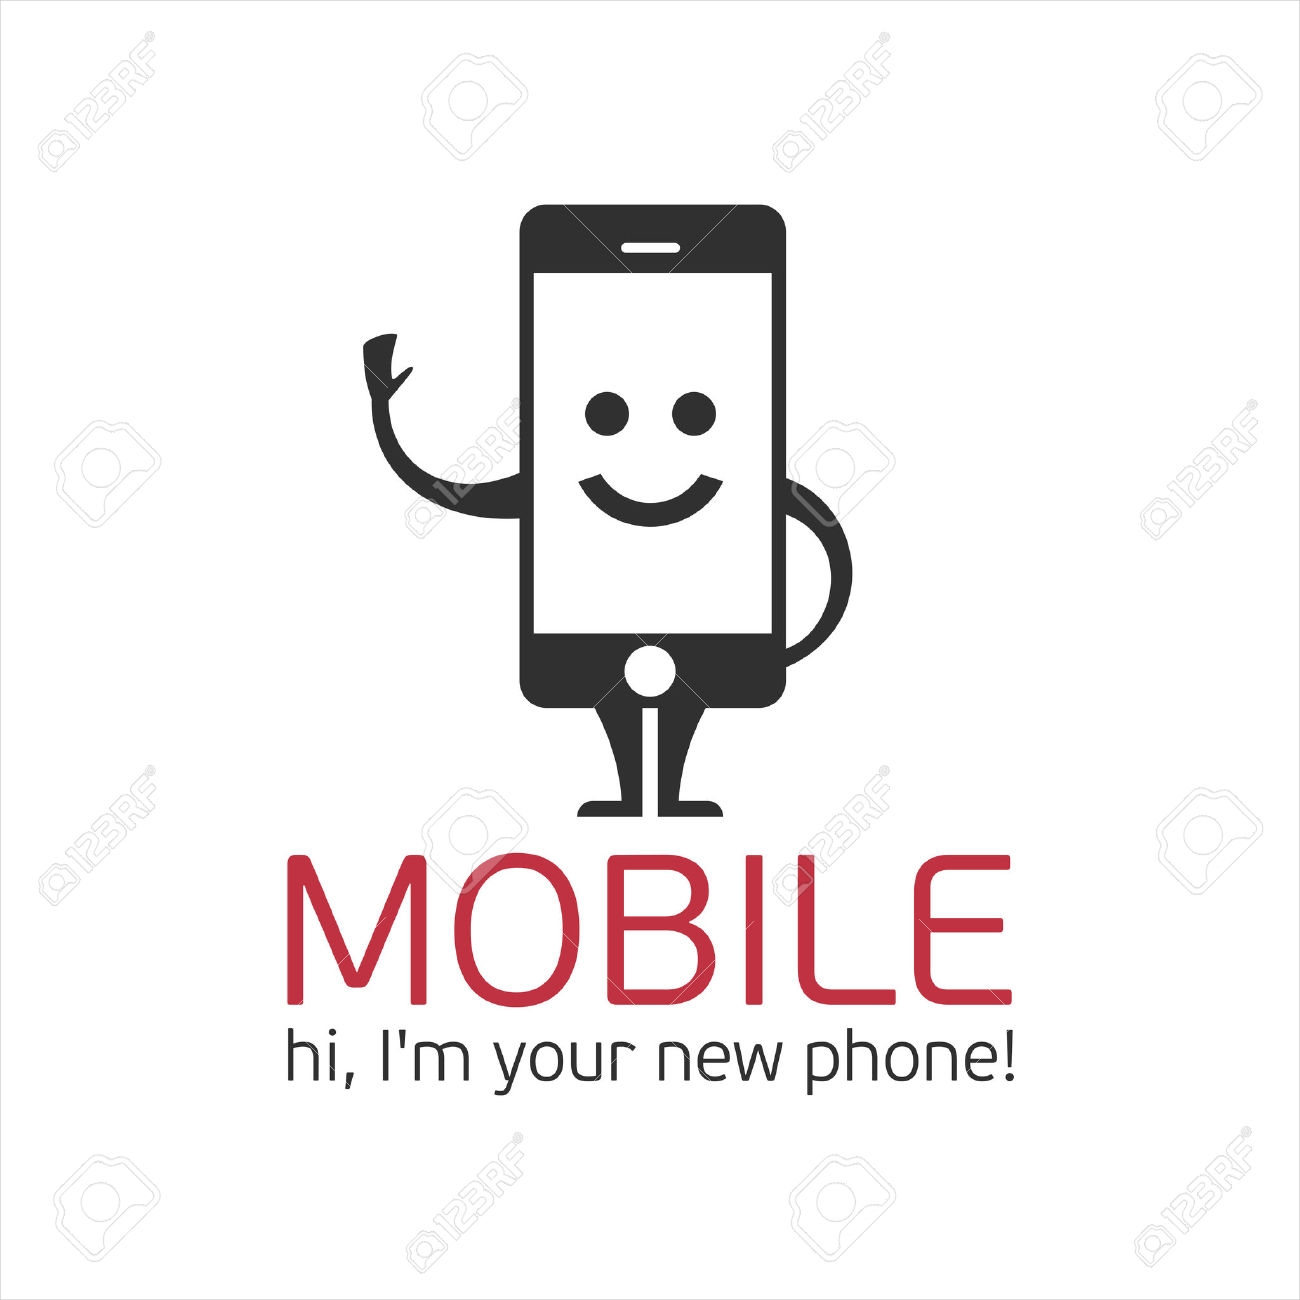 mobile company logo